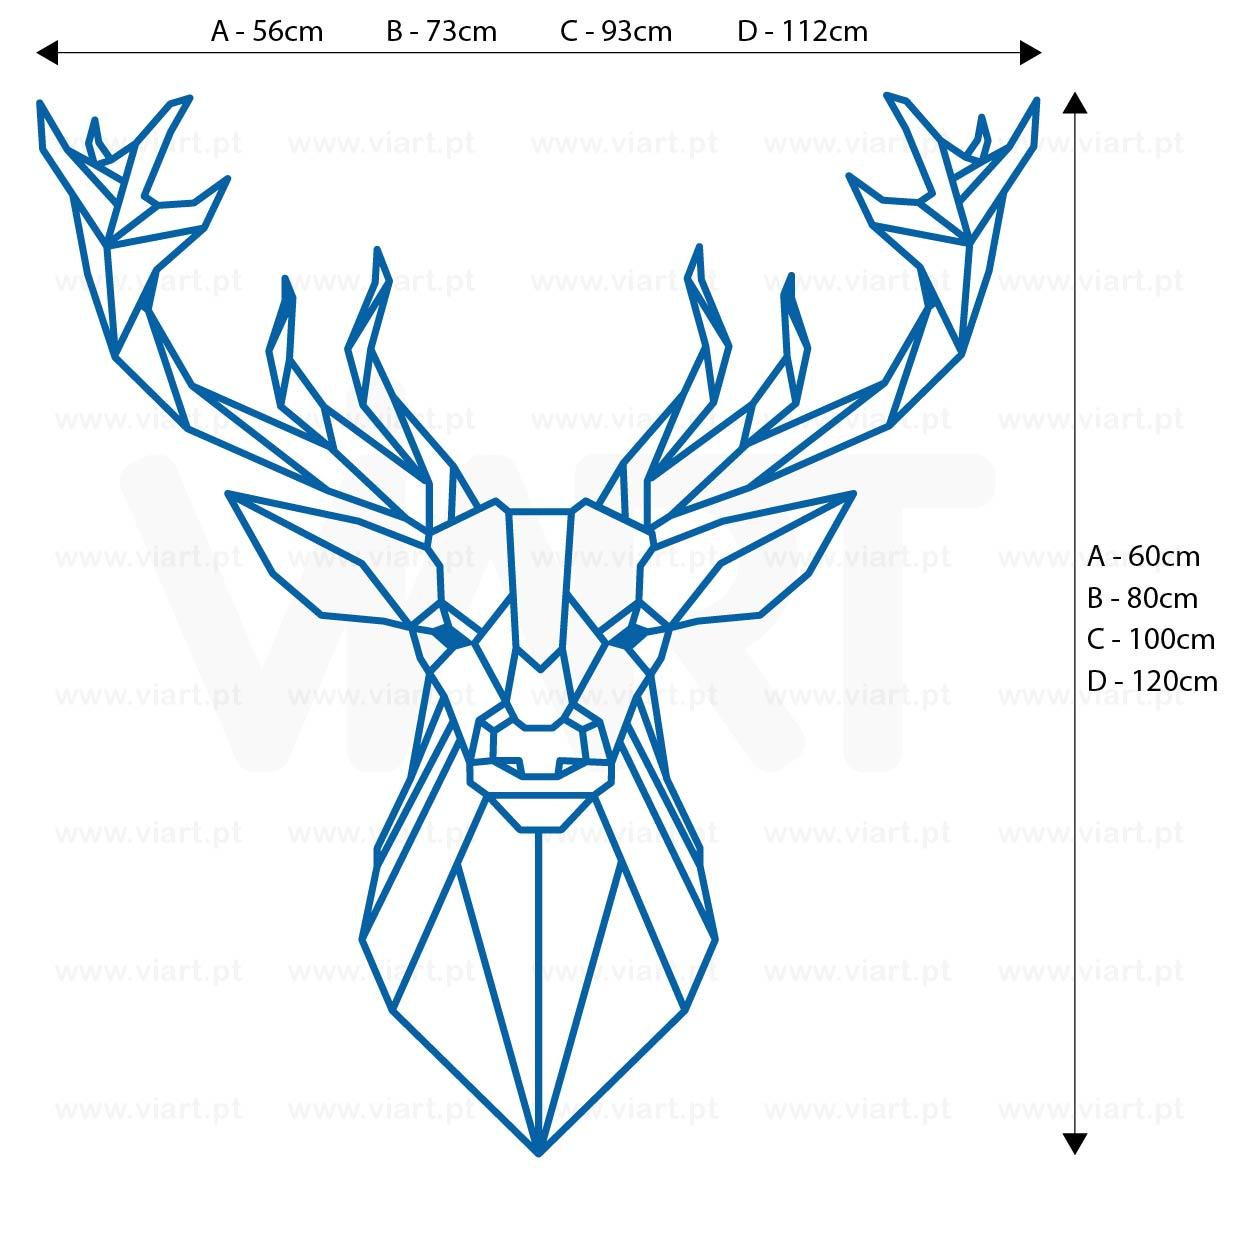 Viart - WALL STICKERS - Geometric Deer Head Decal! Origami! Medidas